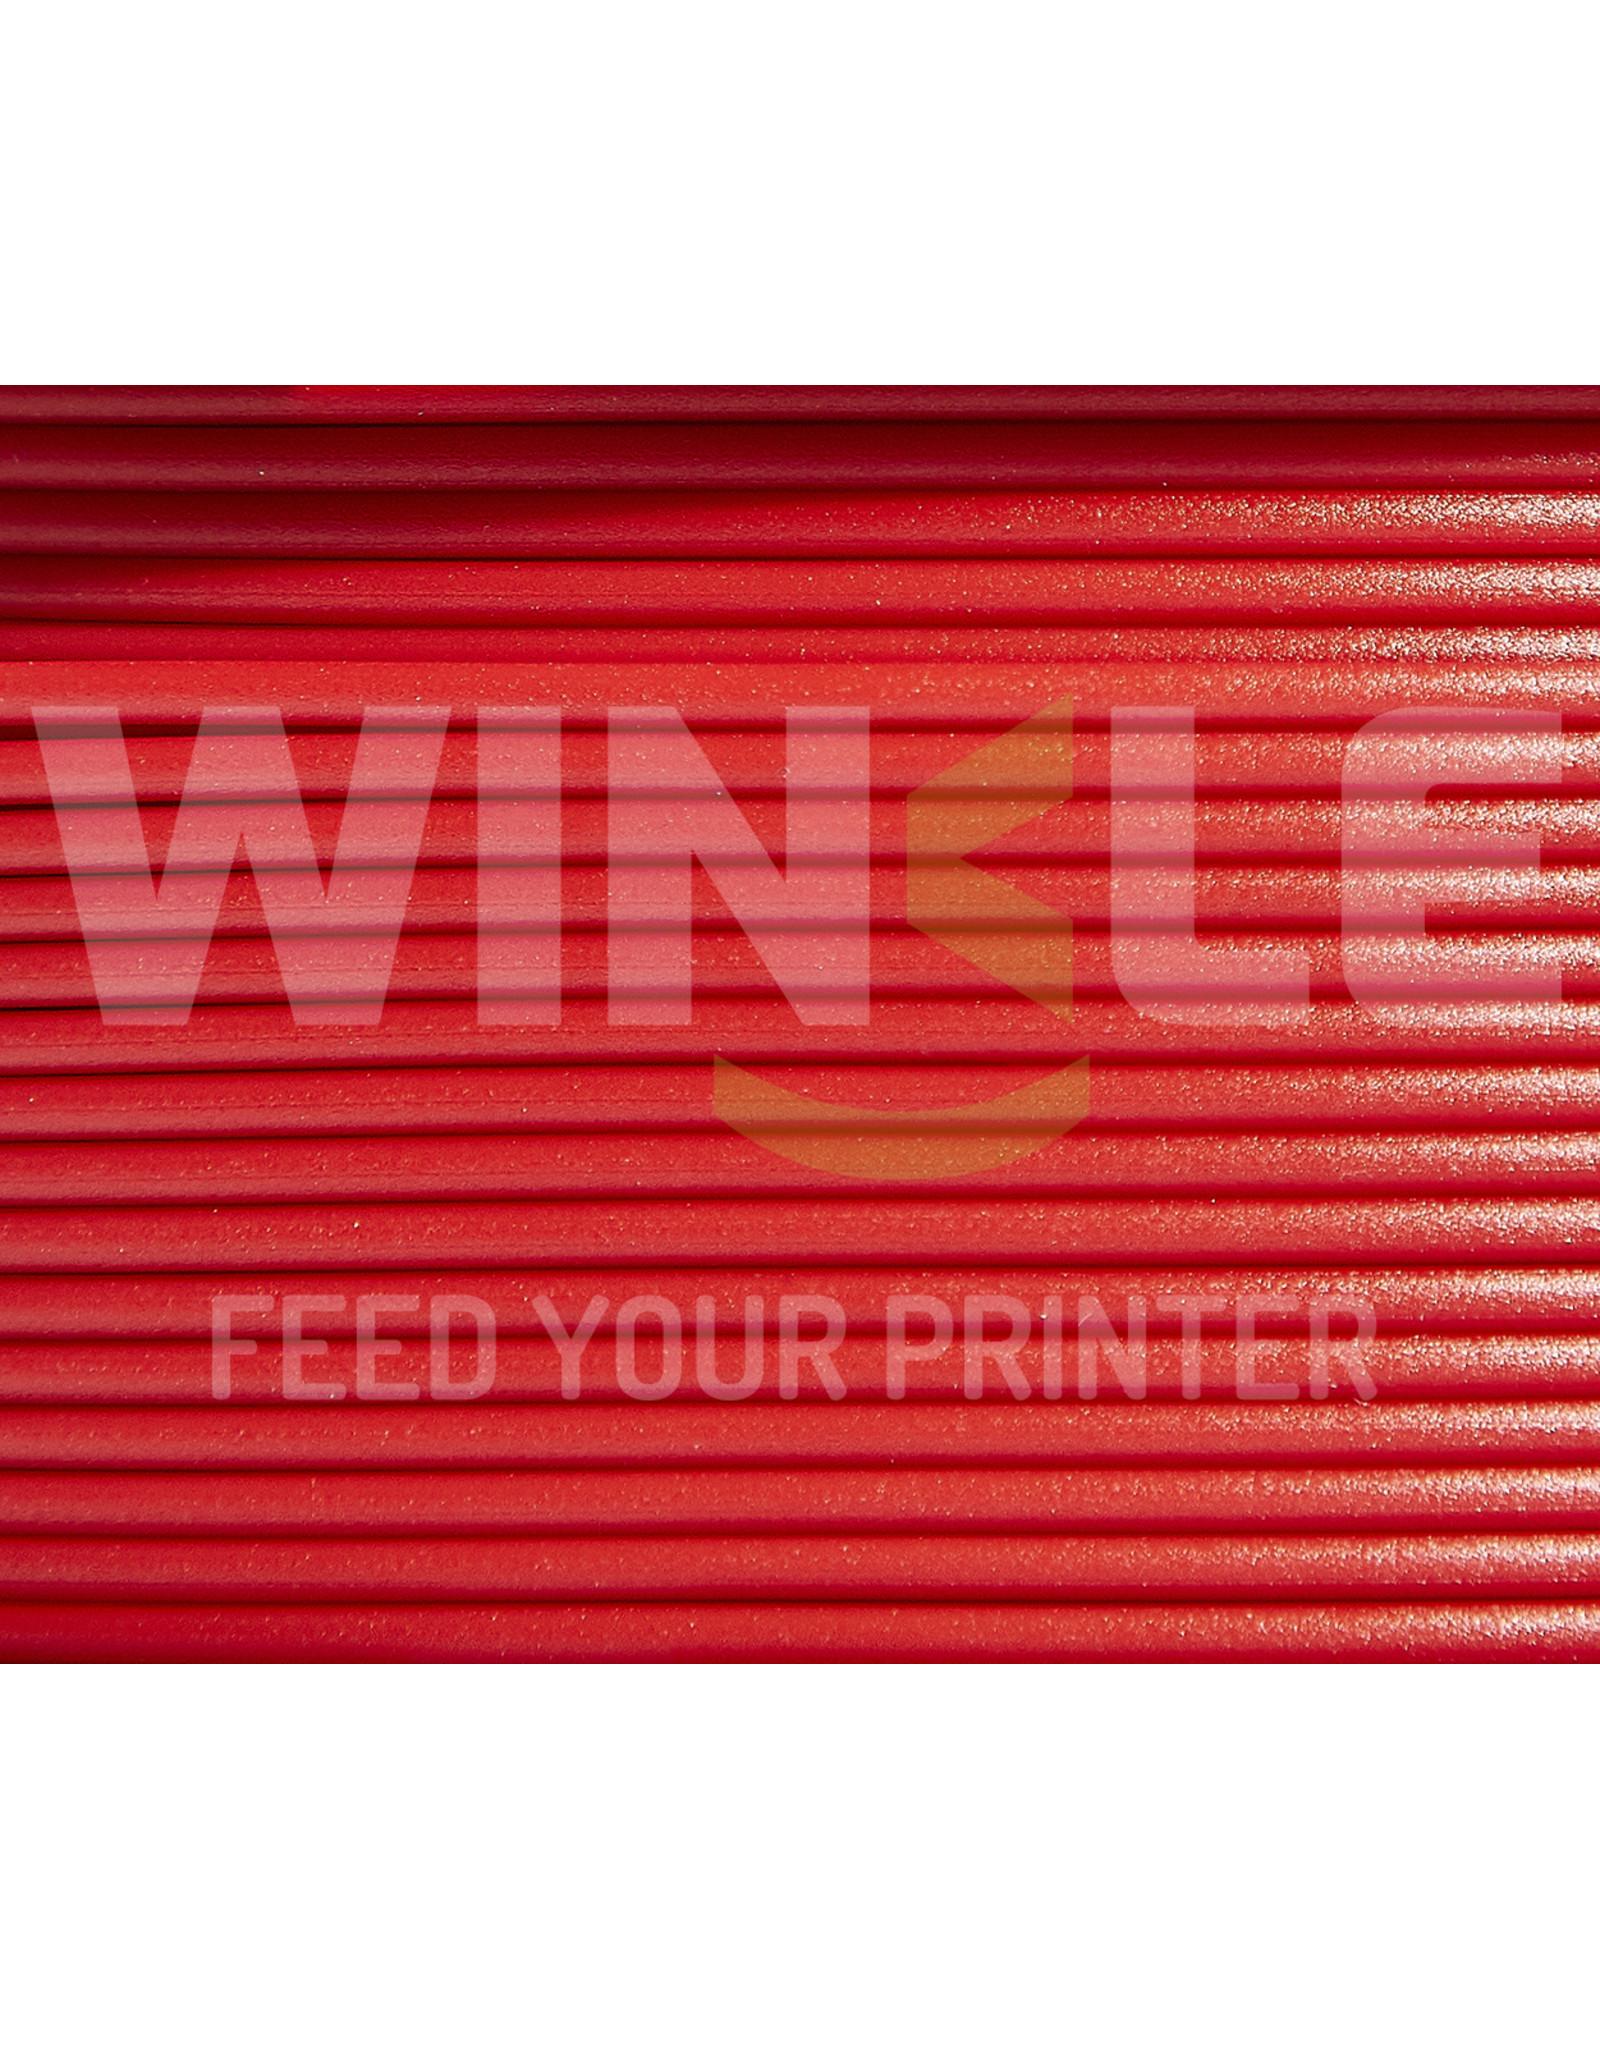 WINKLE PLA IE 870 WINKLE 1kg Red Devil